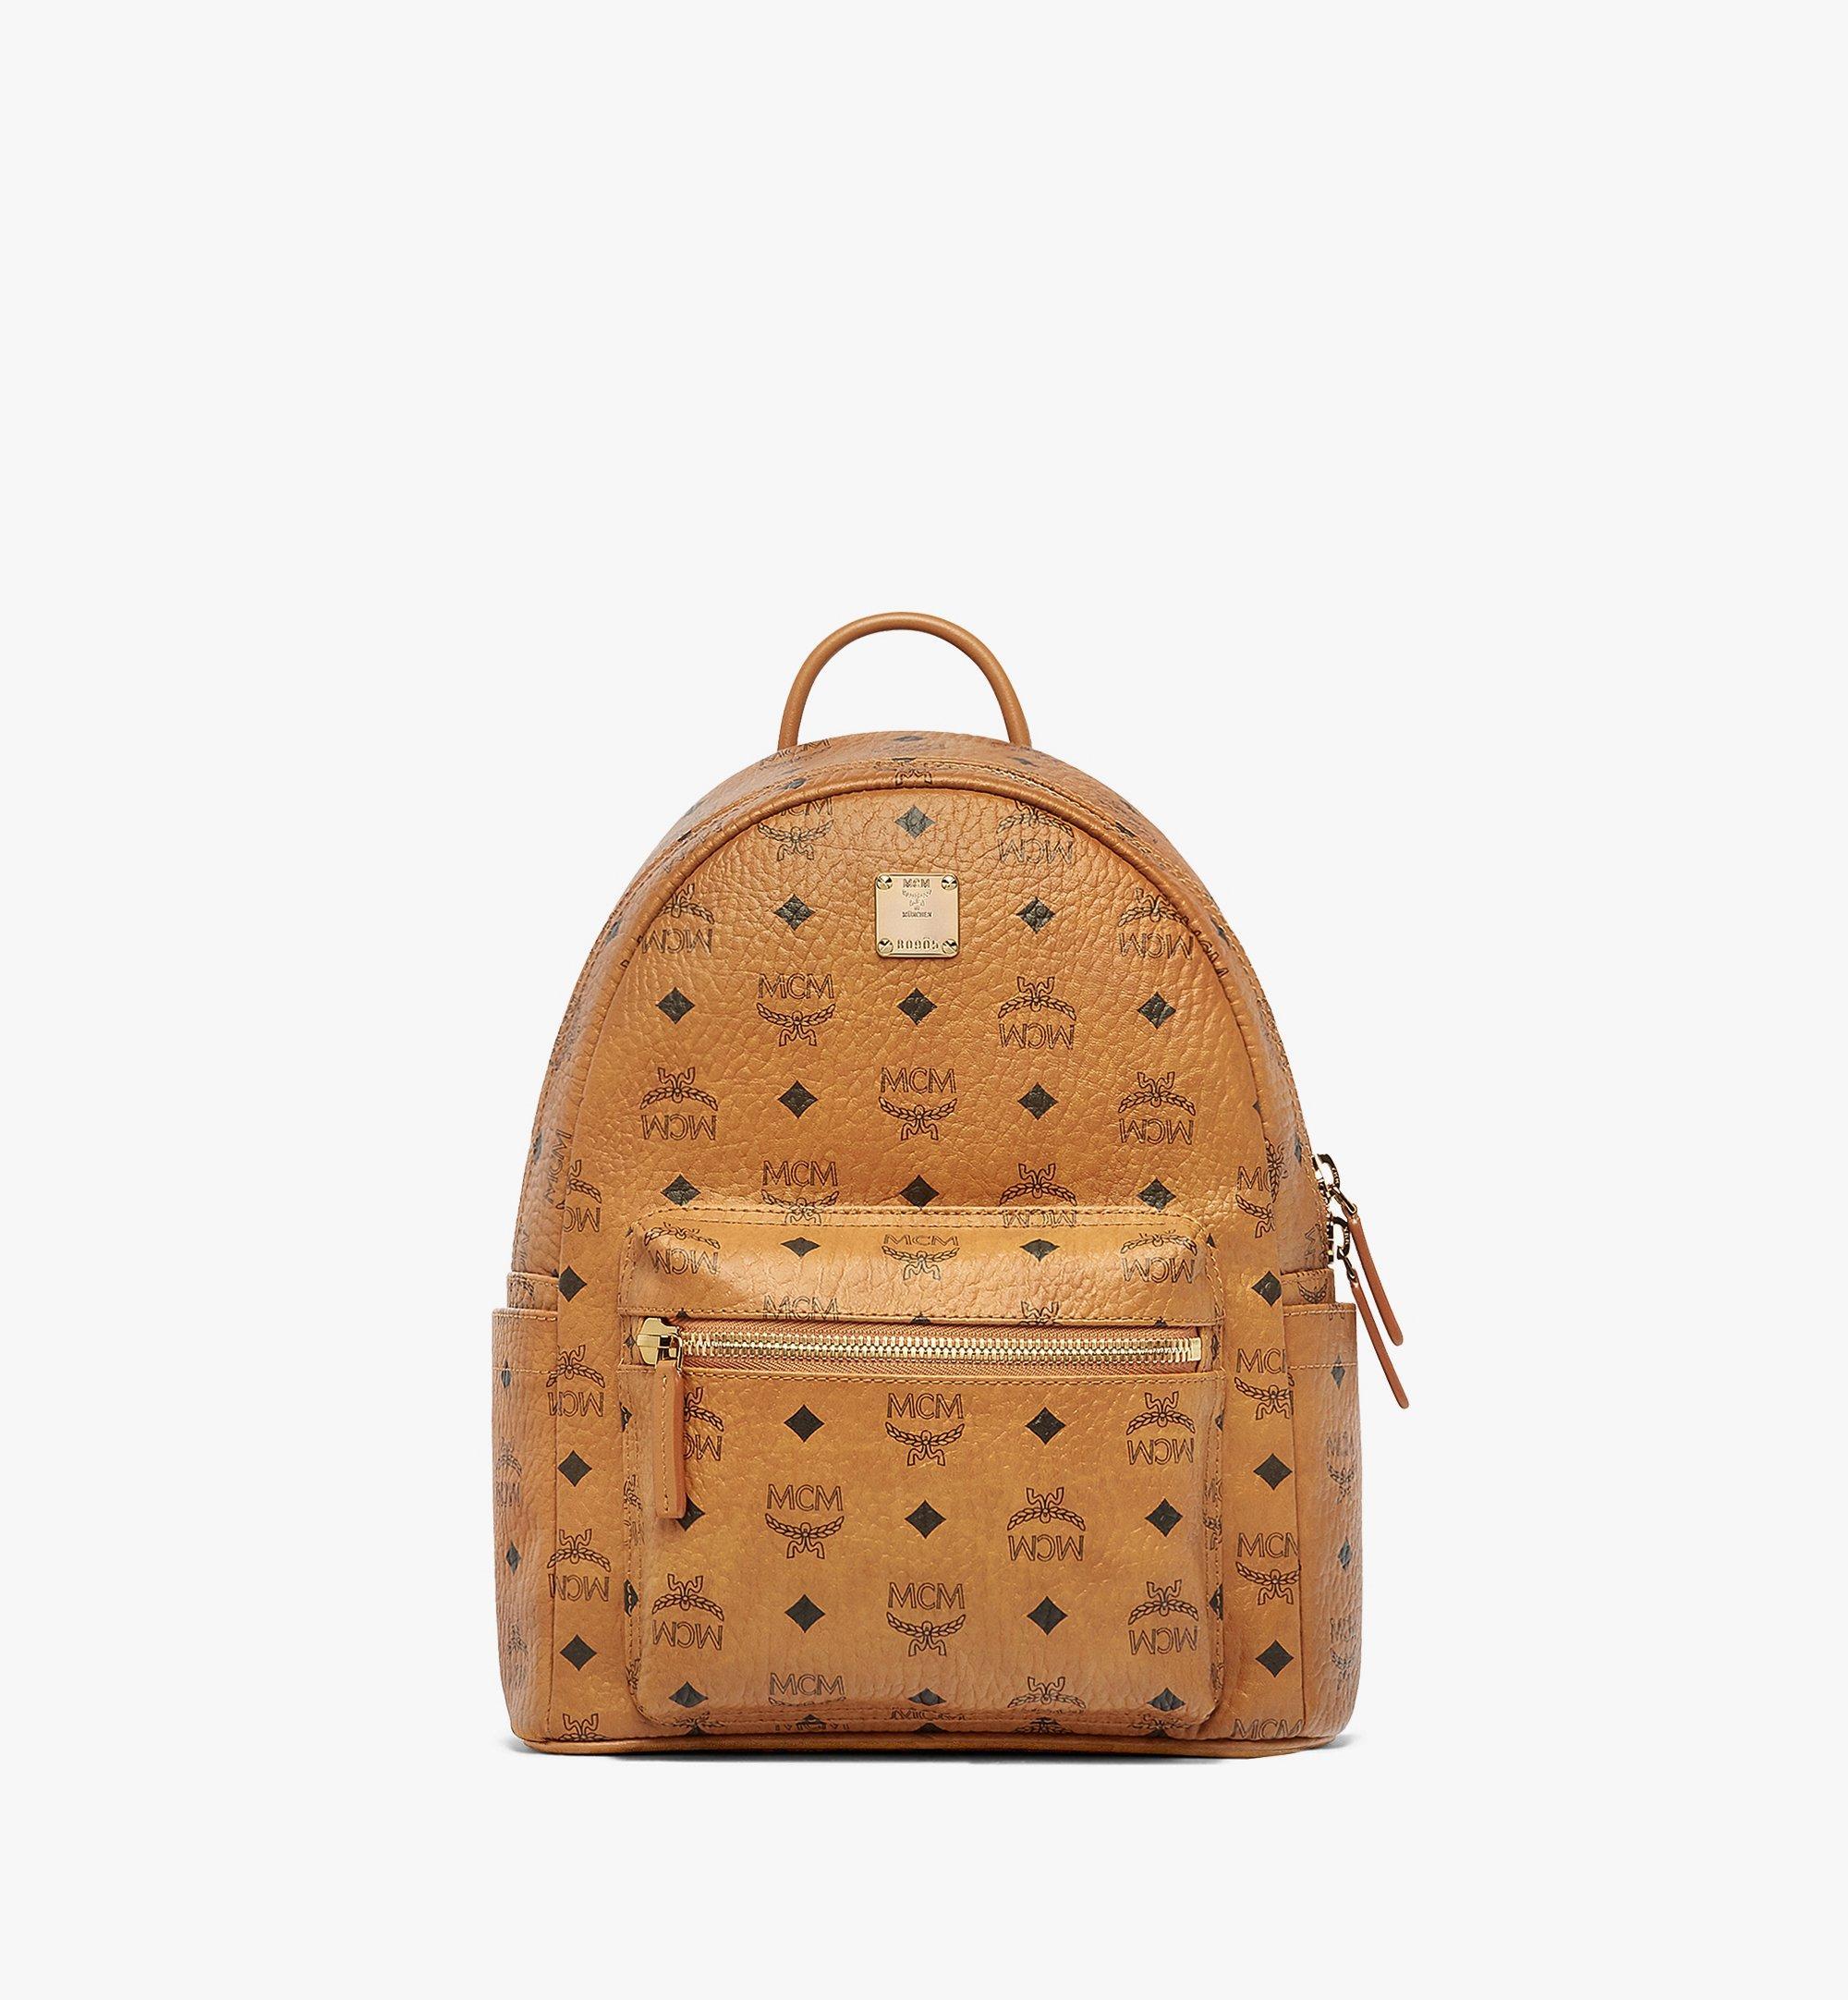 01961d88d 32 cm / 12.5 in Stark Classic Backpack in Visetos Cognac   MCM